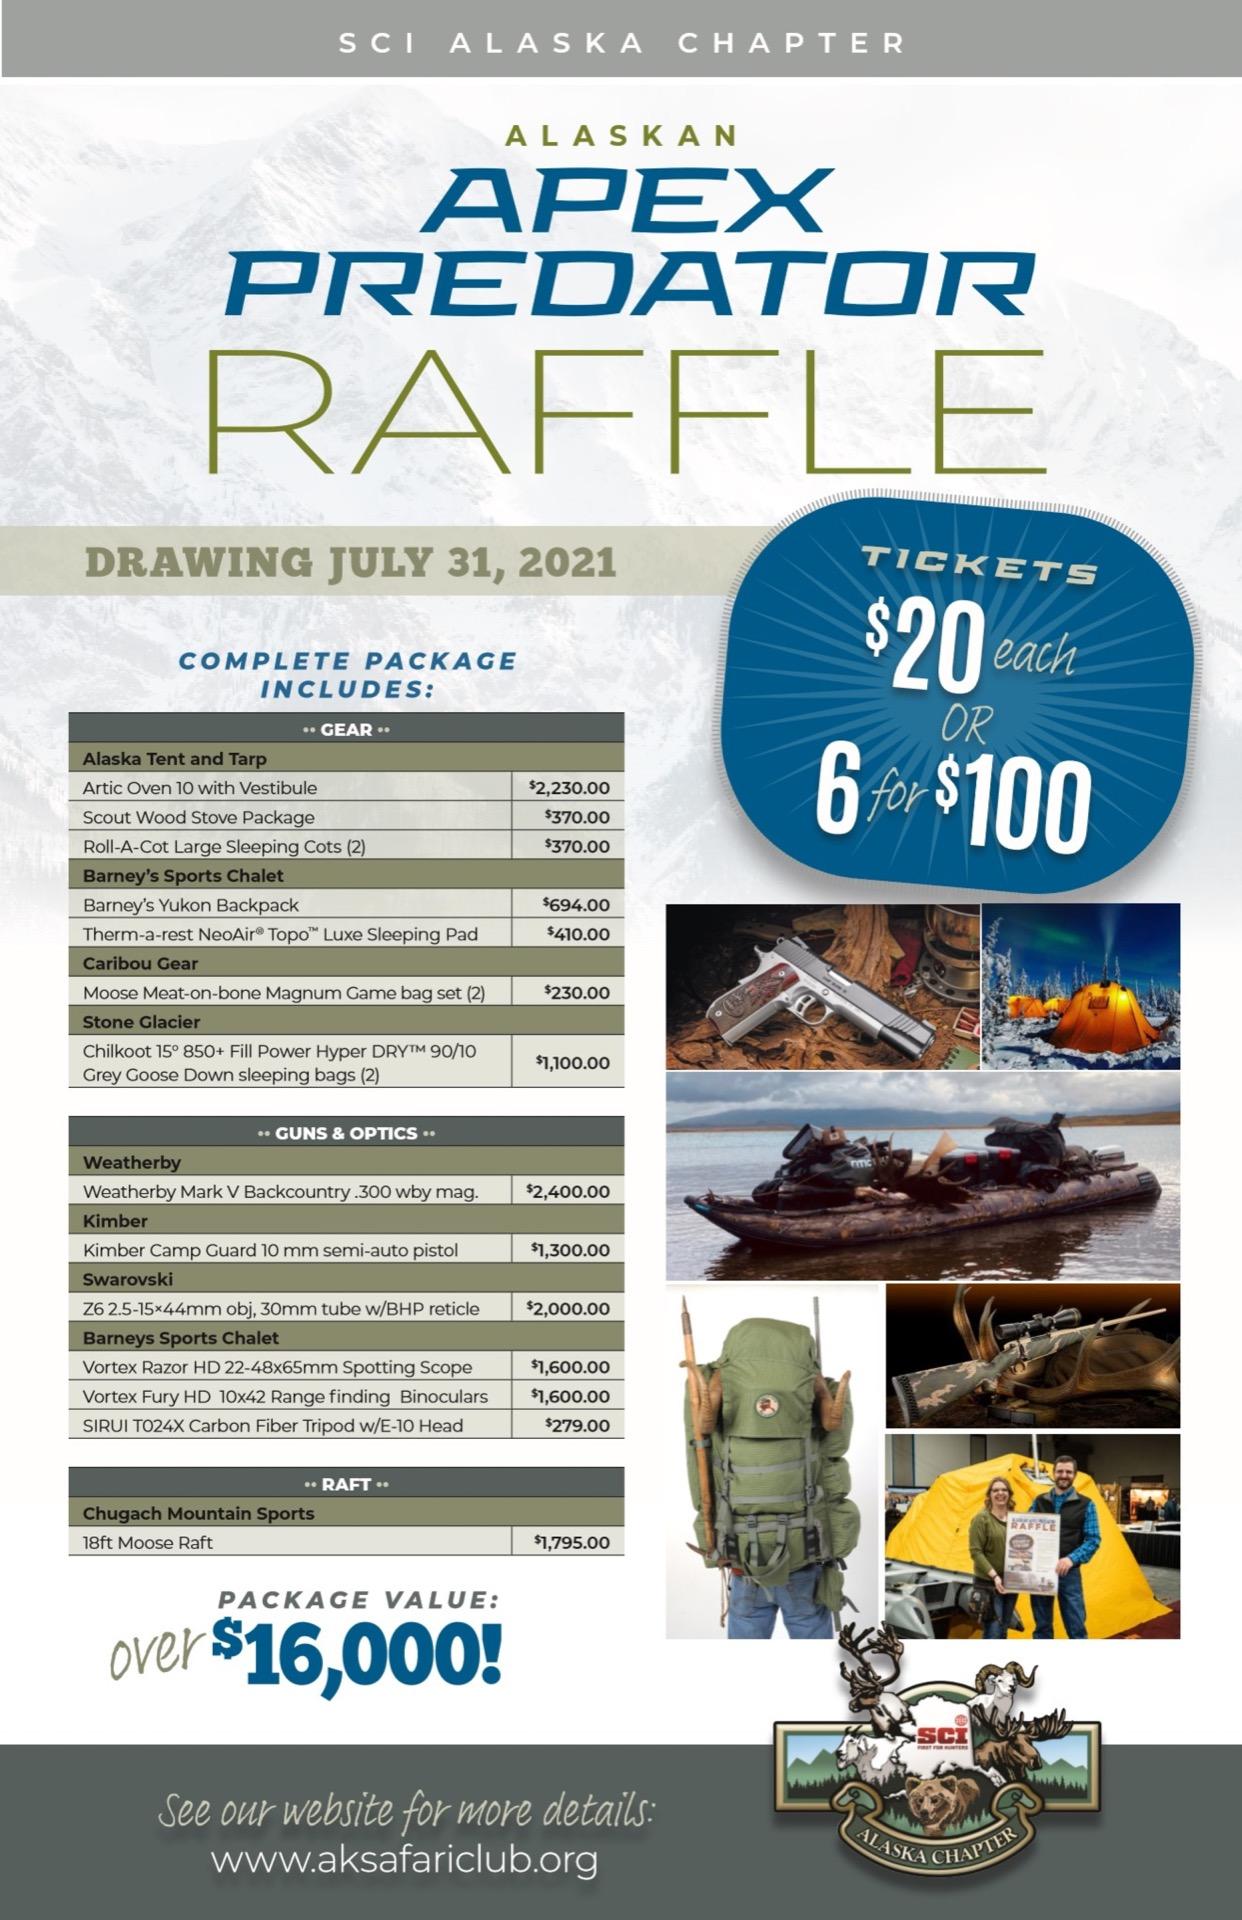 2021 Alaskan APEX Predator Raffle Flyer